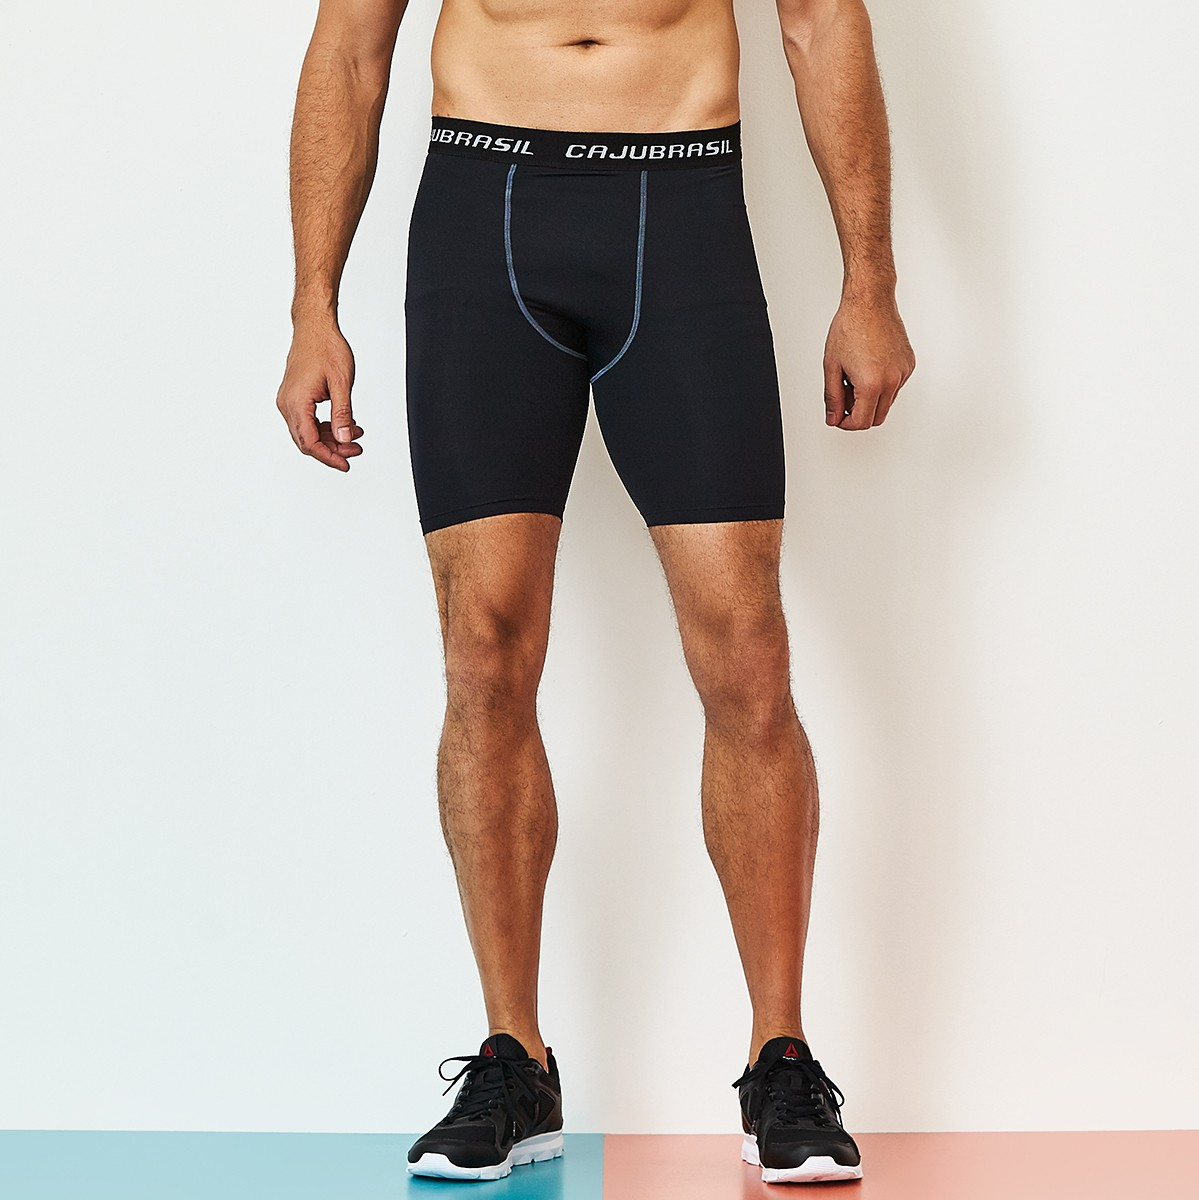 Short Térmic Preto CAJUBRASIL Activewear